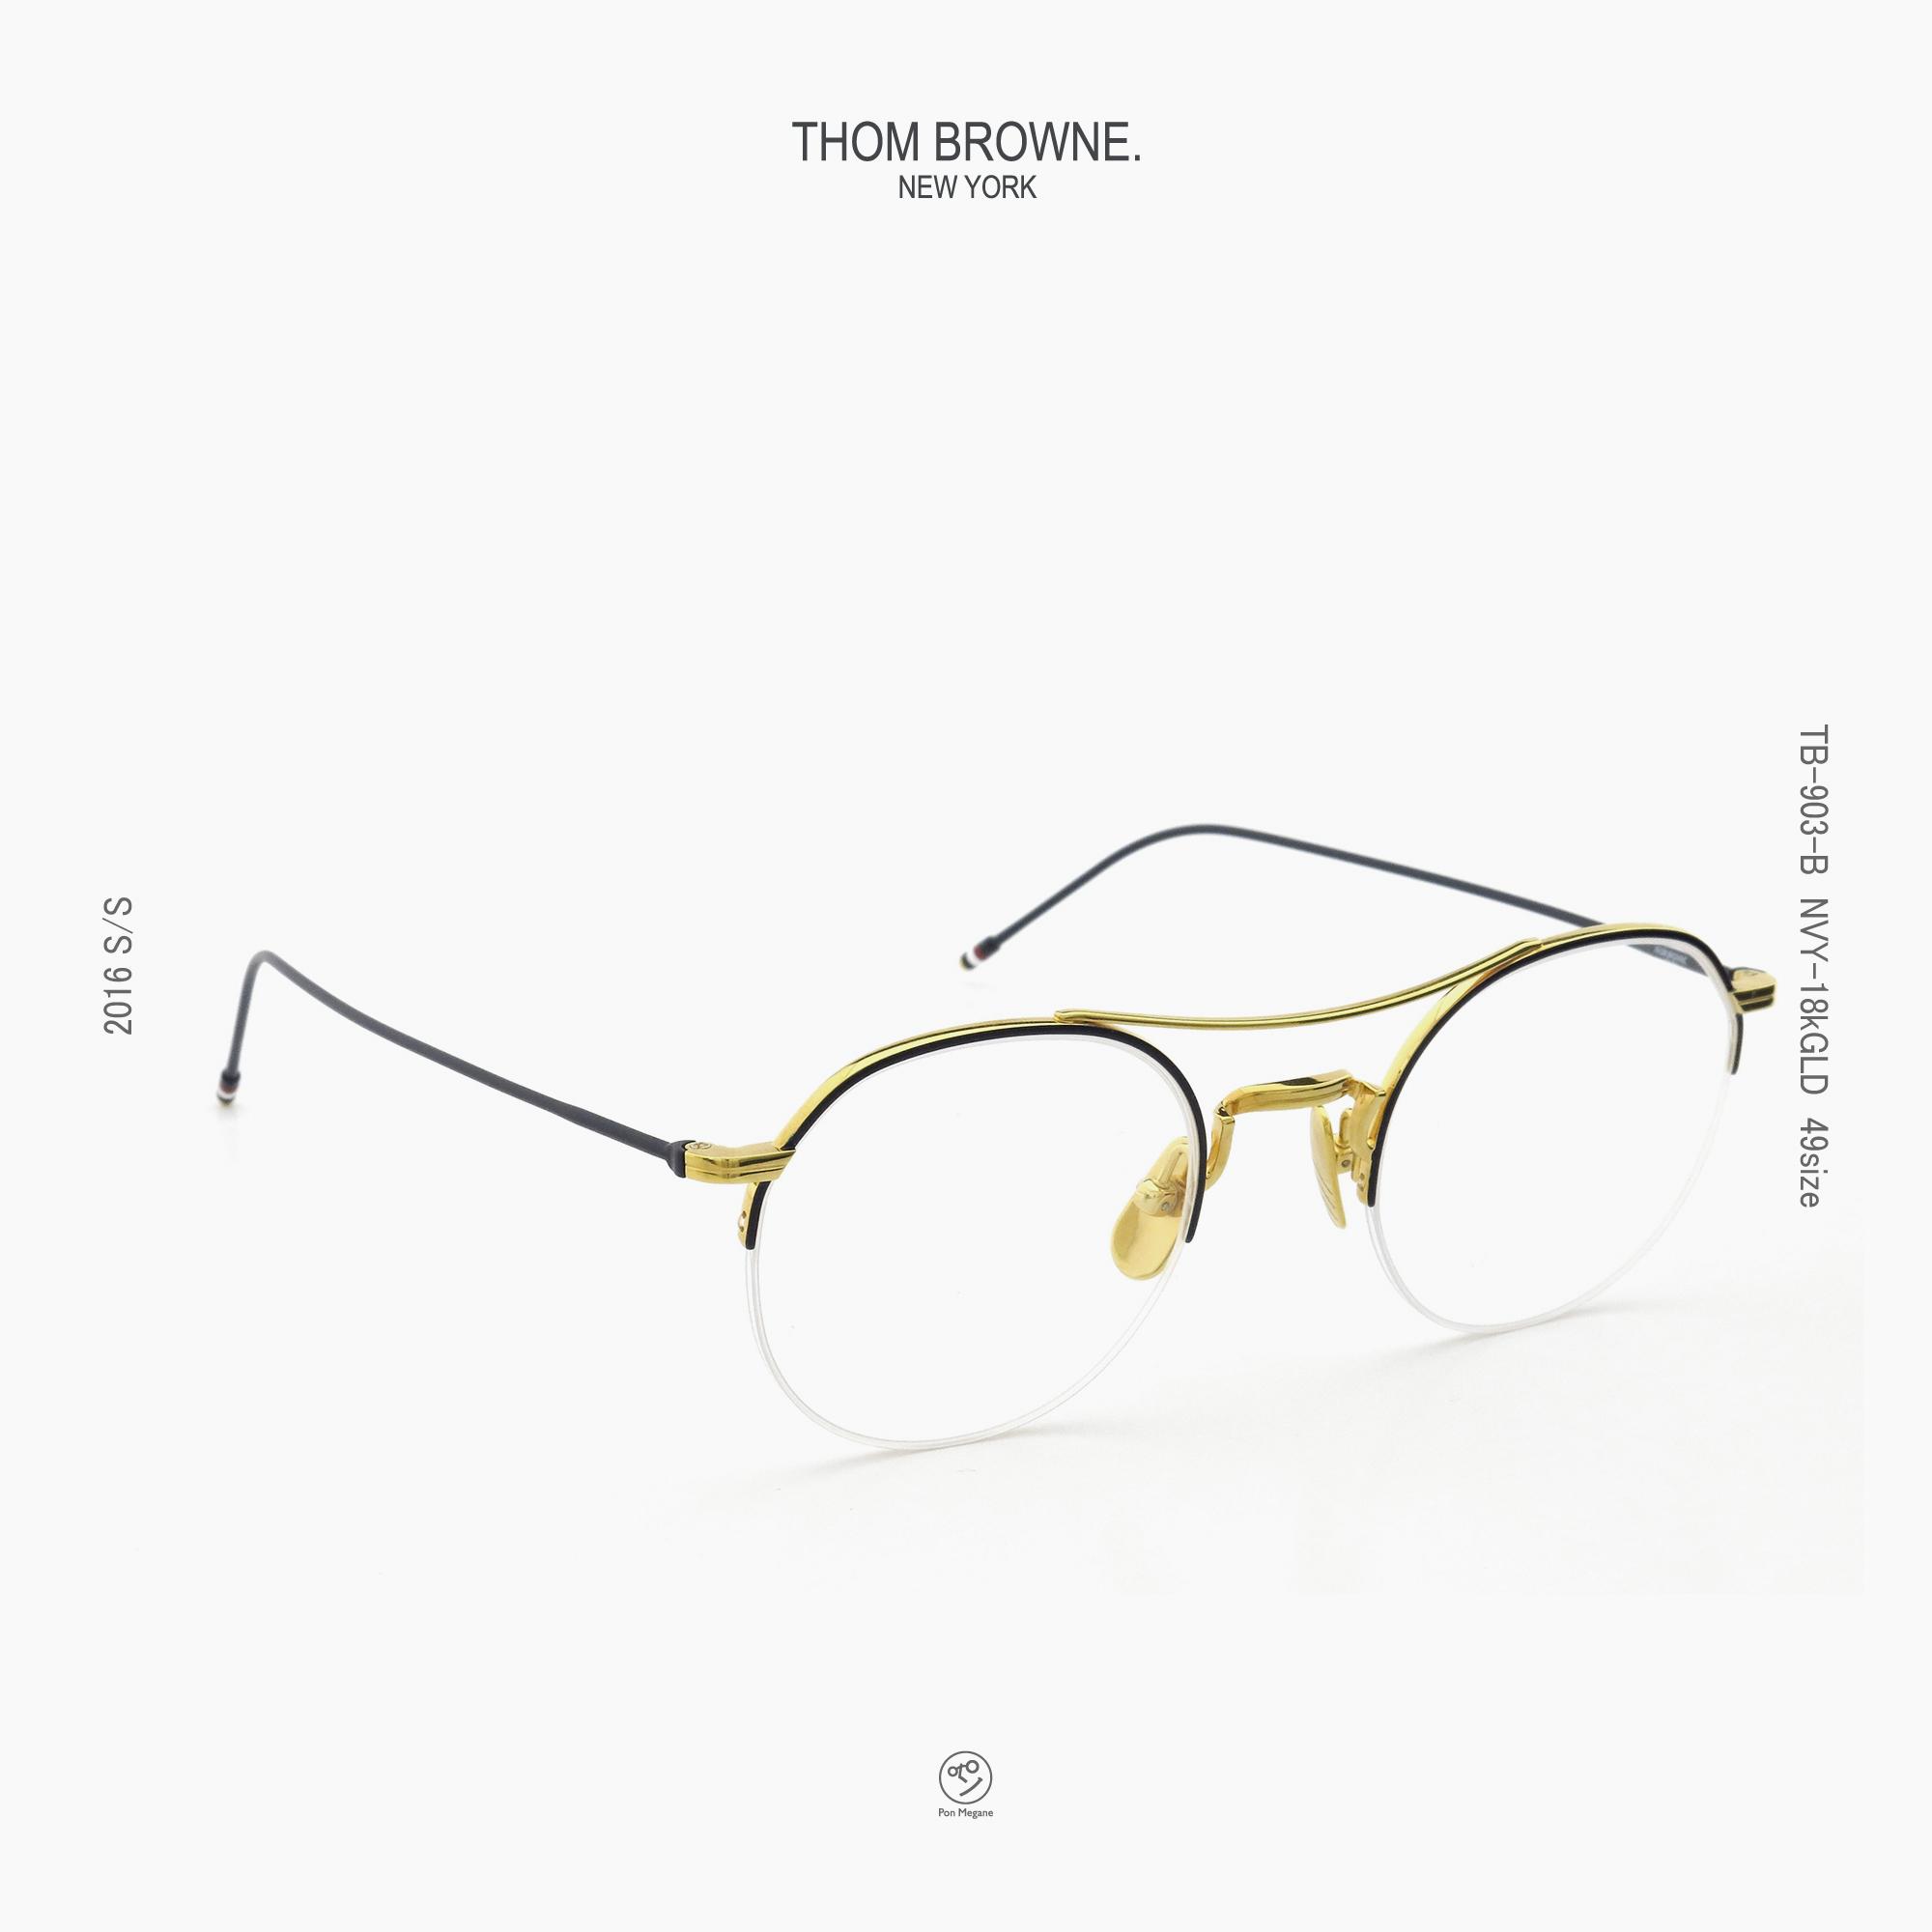 THOM-BROWNE_TB-903-B_NVY-18KGLD_49_insta